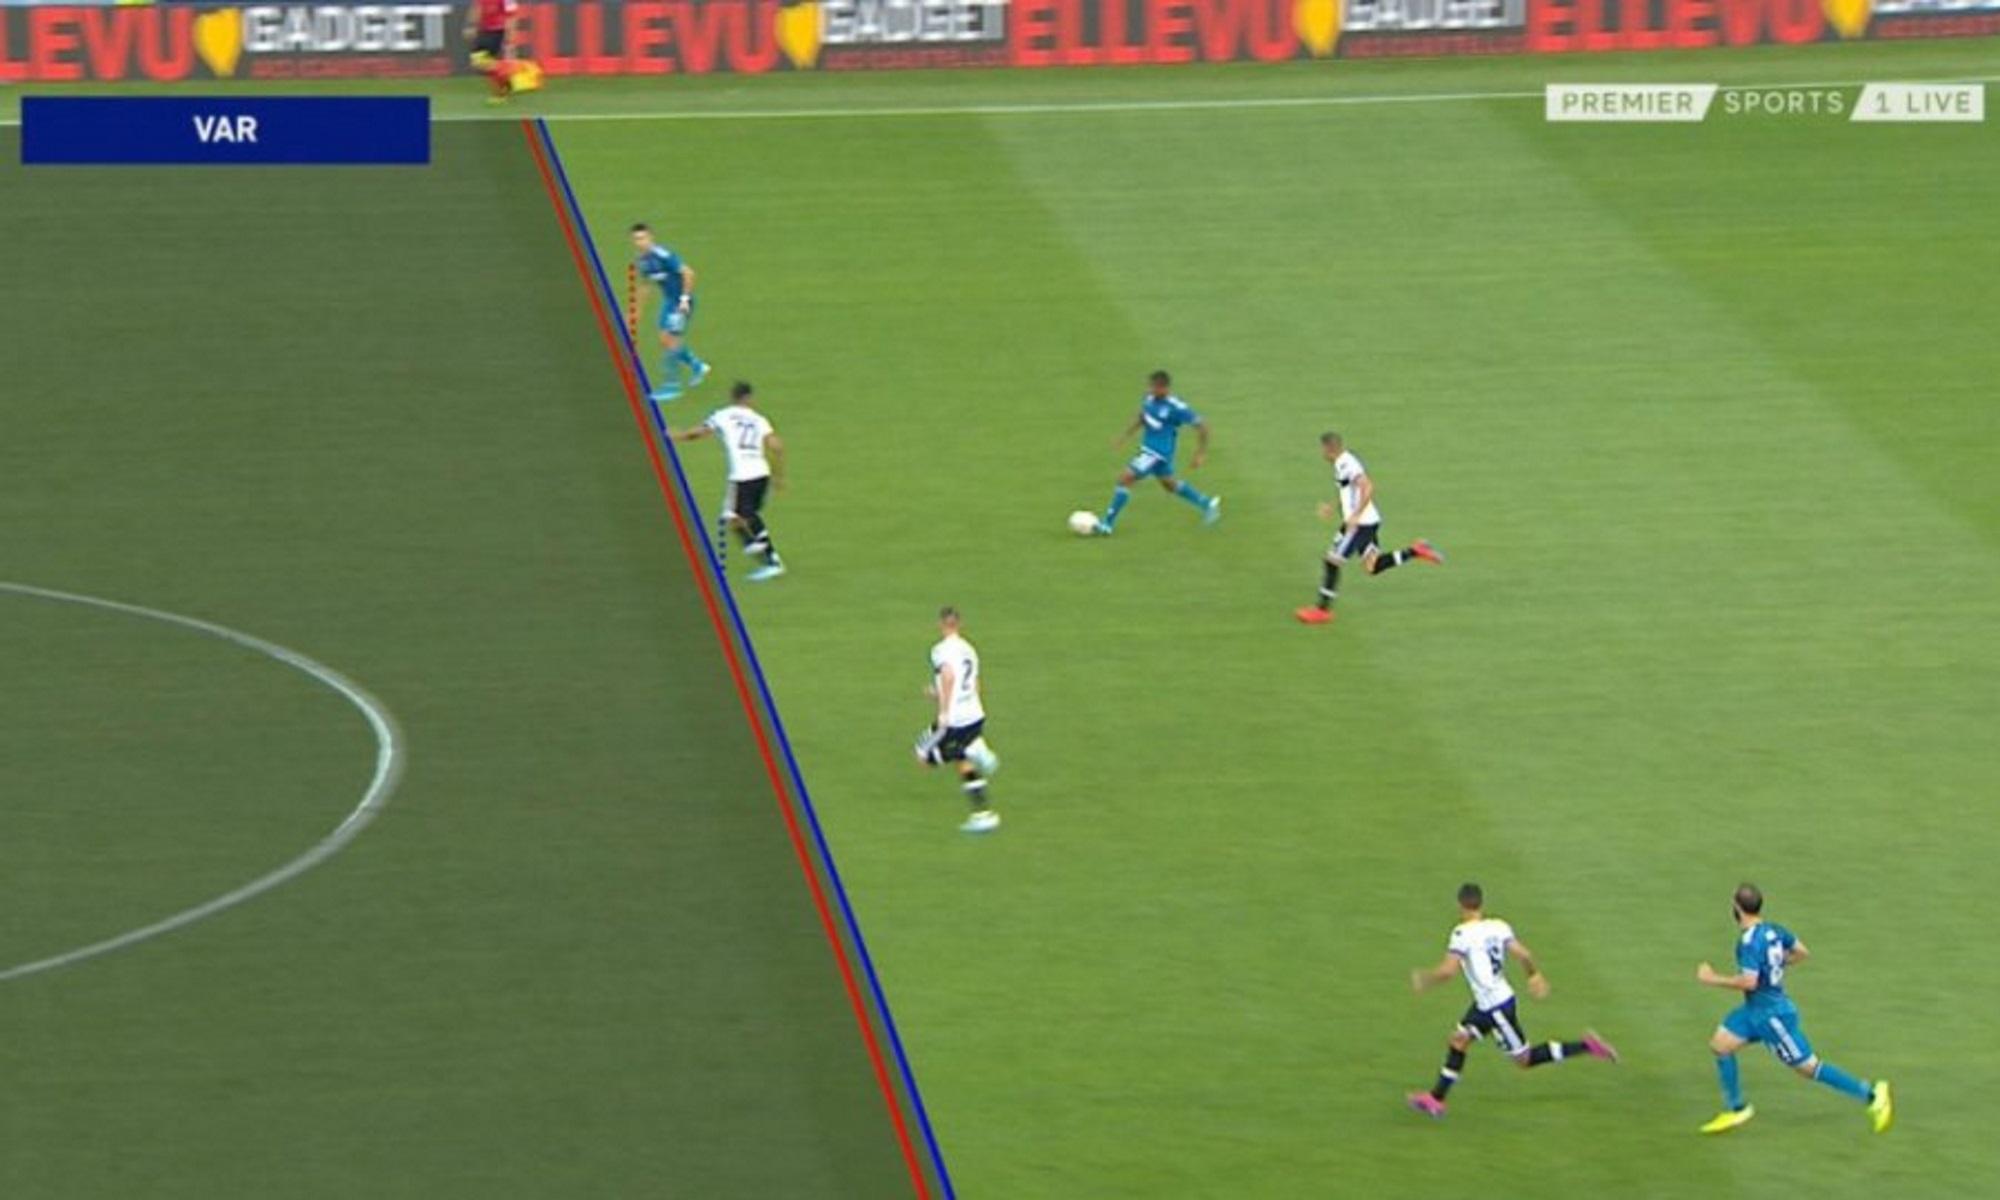 UEFA: Ο Τσέφεριν βγάζει… μεζούρα για το οφσάιντ! Ζητά περιθώριο εκατοστών